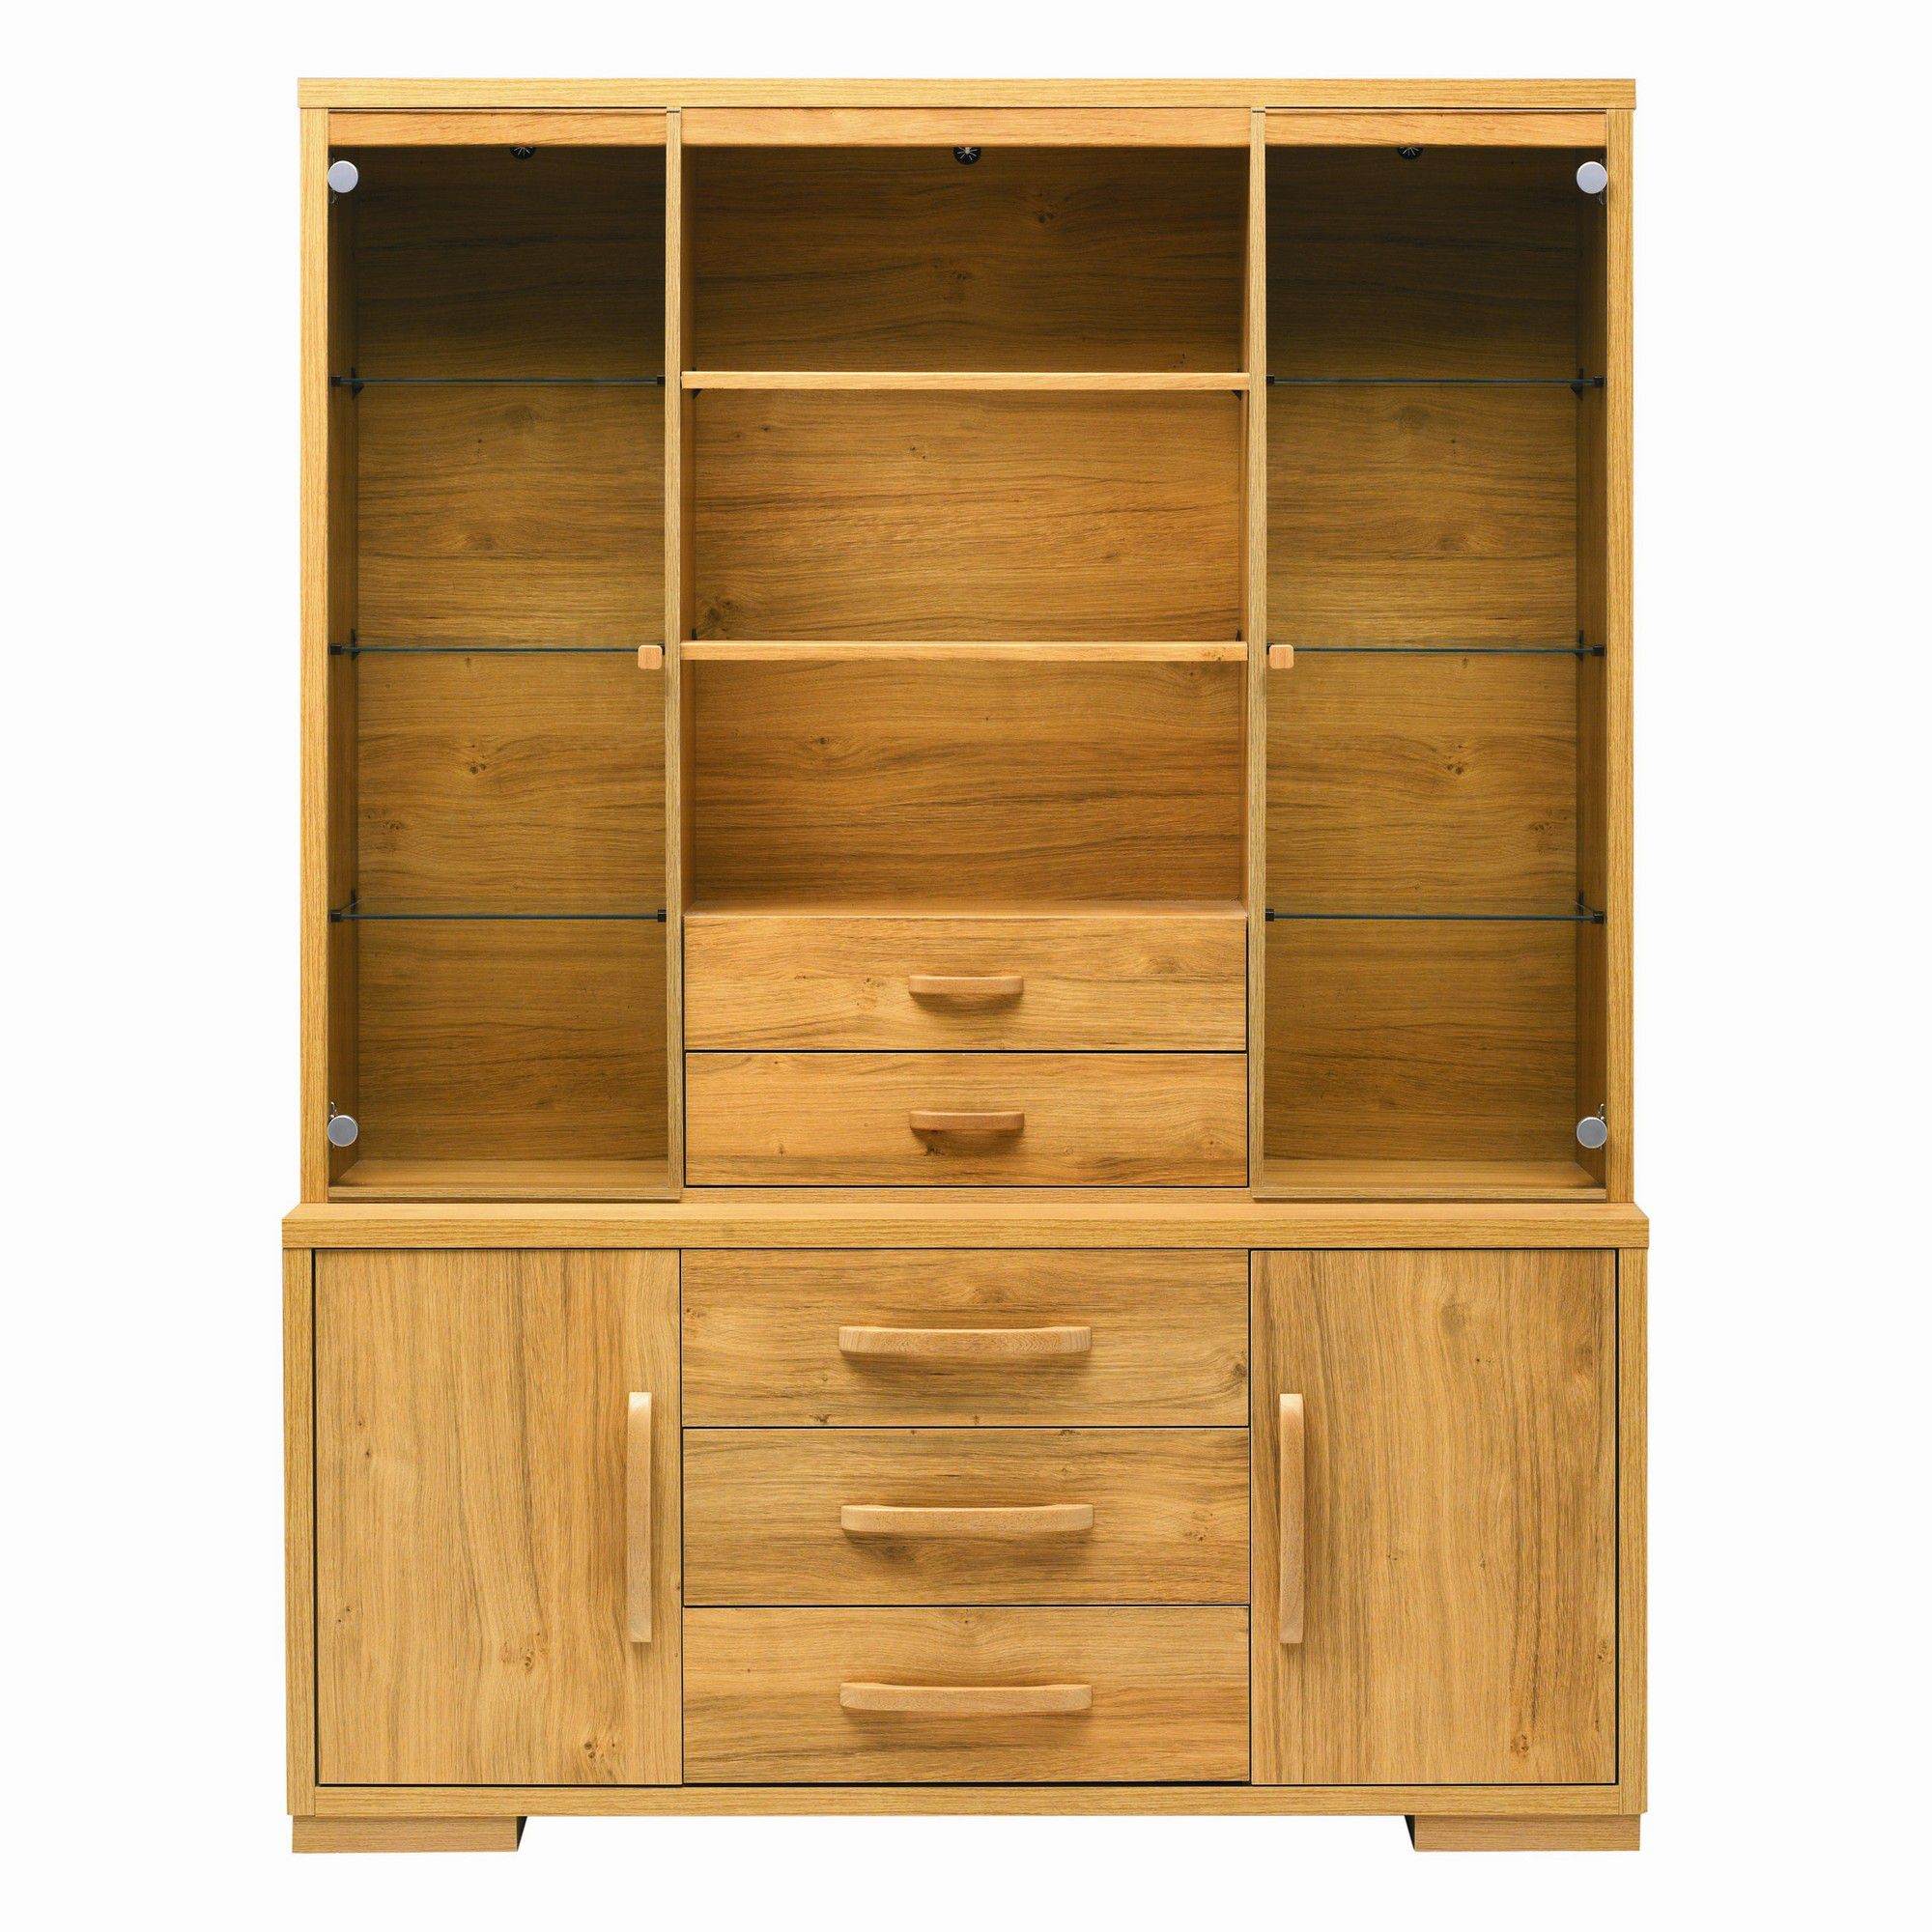 comely strata bedroom furniture. Harveys Bedroom Furniture Wardrobes Building1st Com Caxton Henley  Farmersagentartruiz com